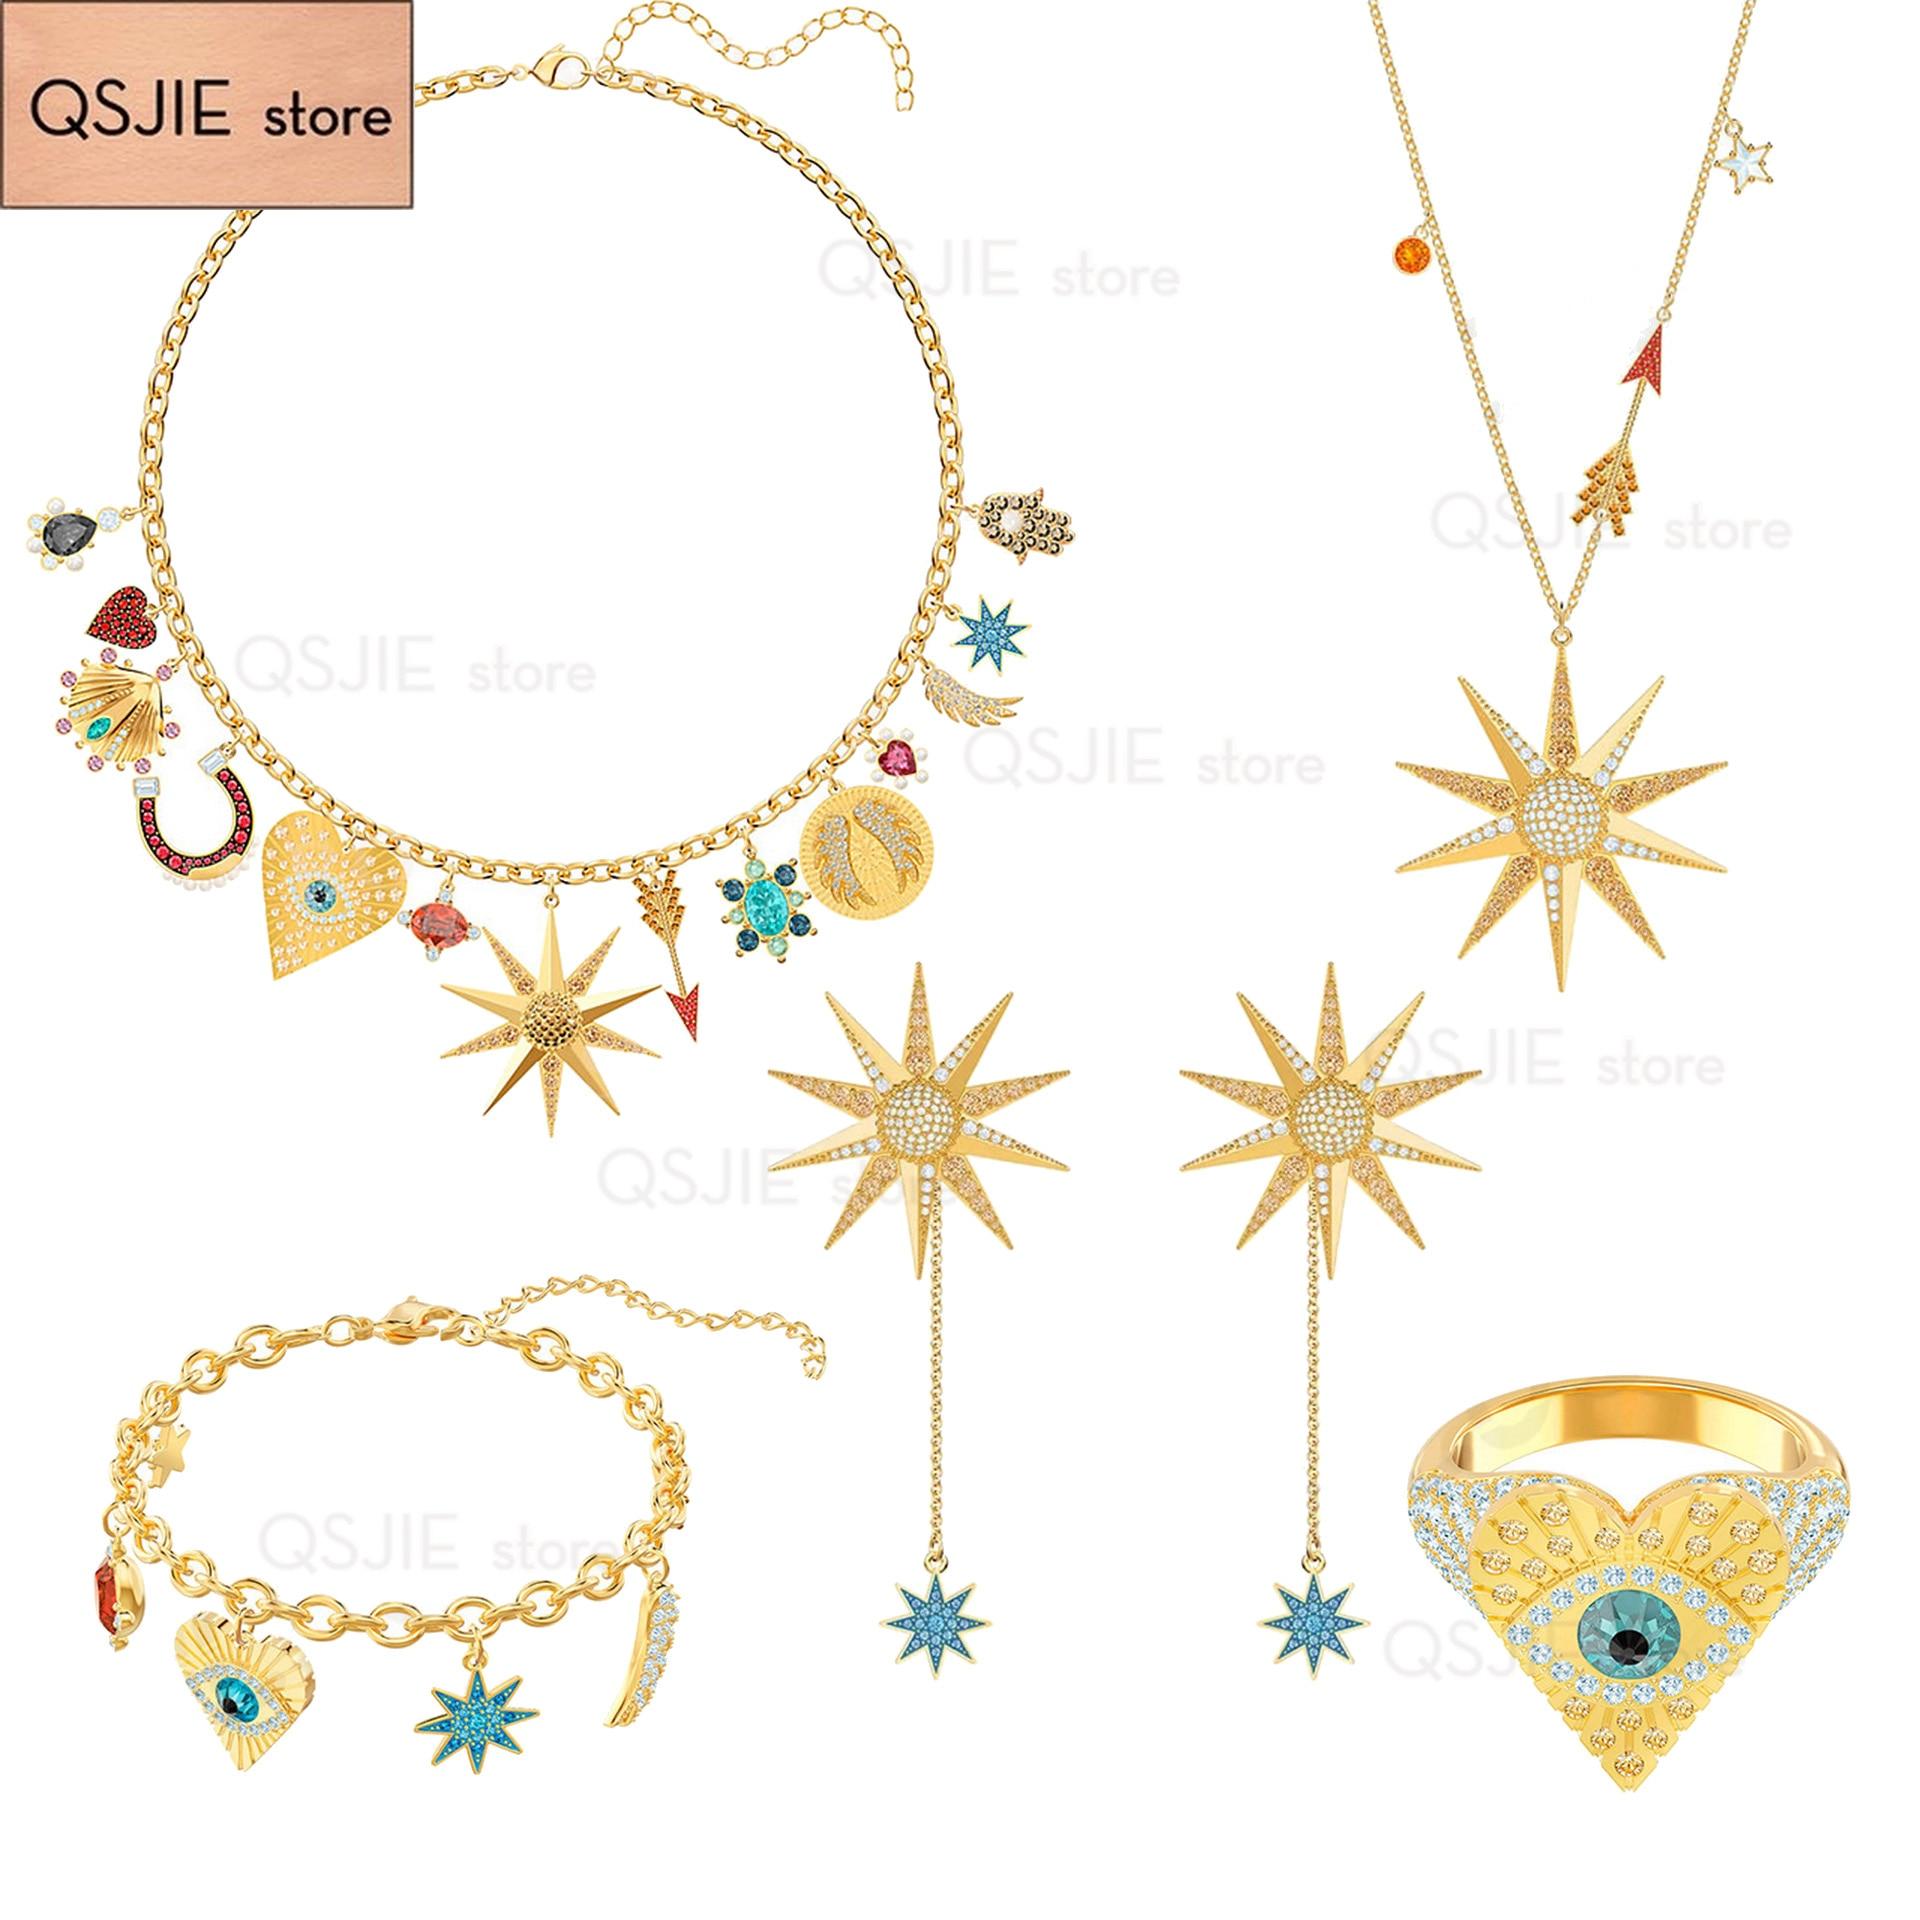 QSJIE High quality SWA Tarot series of women's Pendant Necklace Charm of fashion jewelry